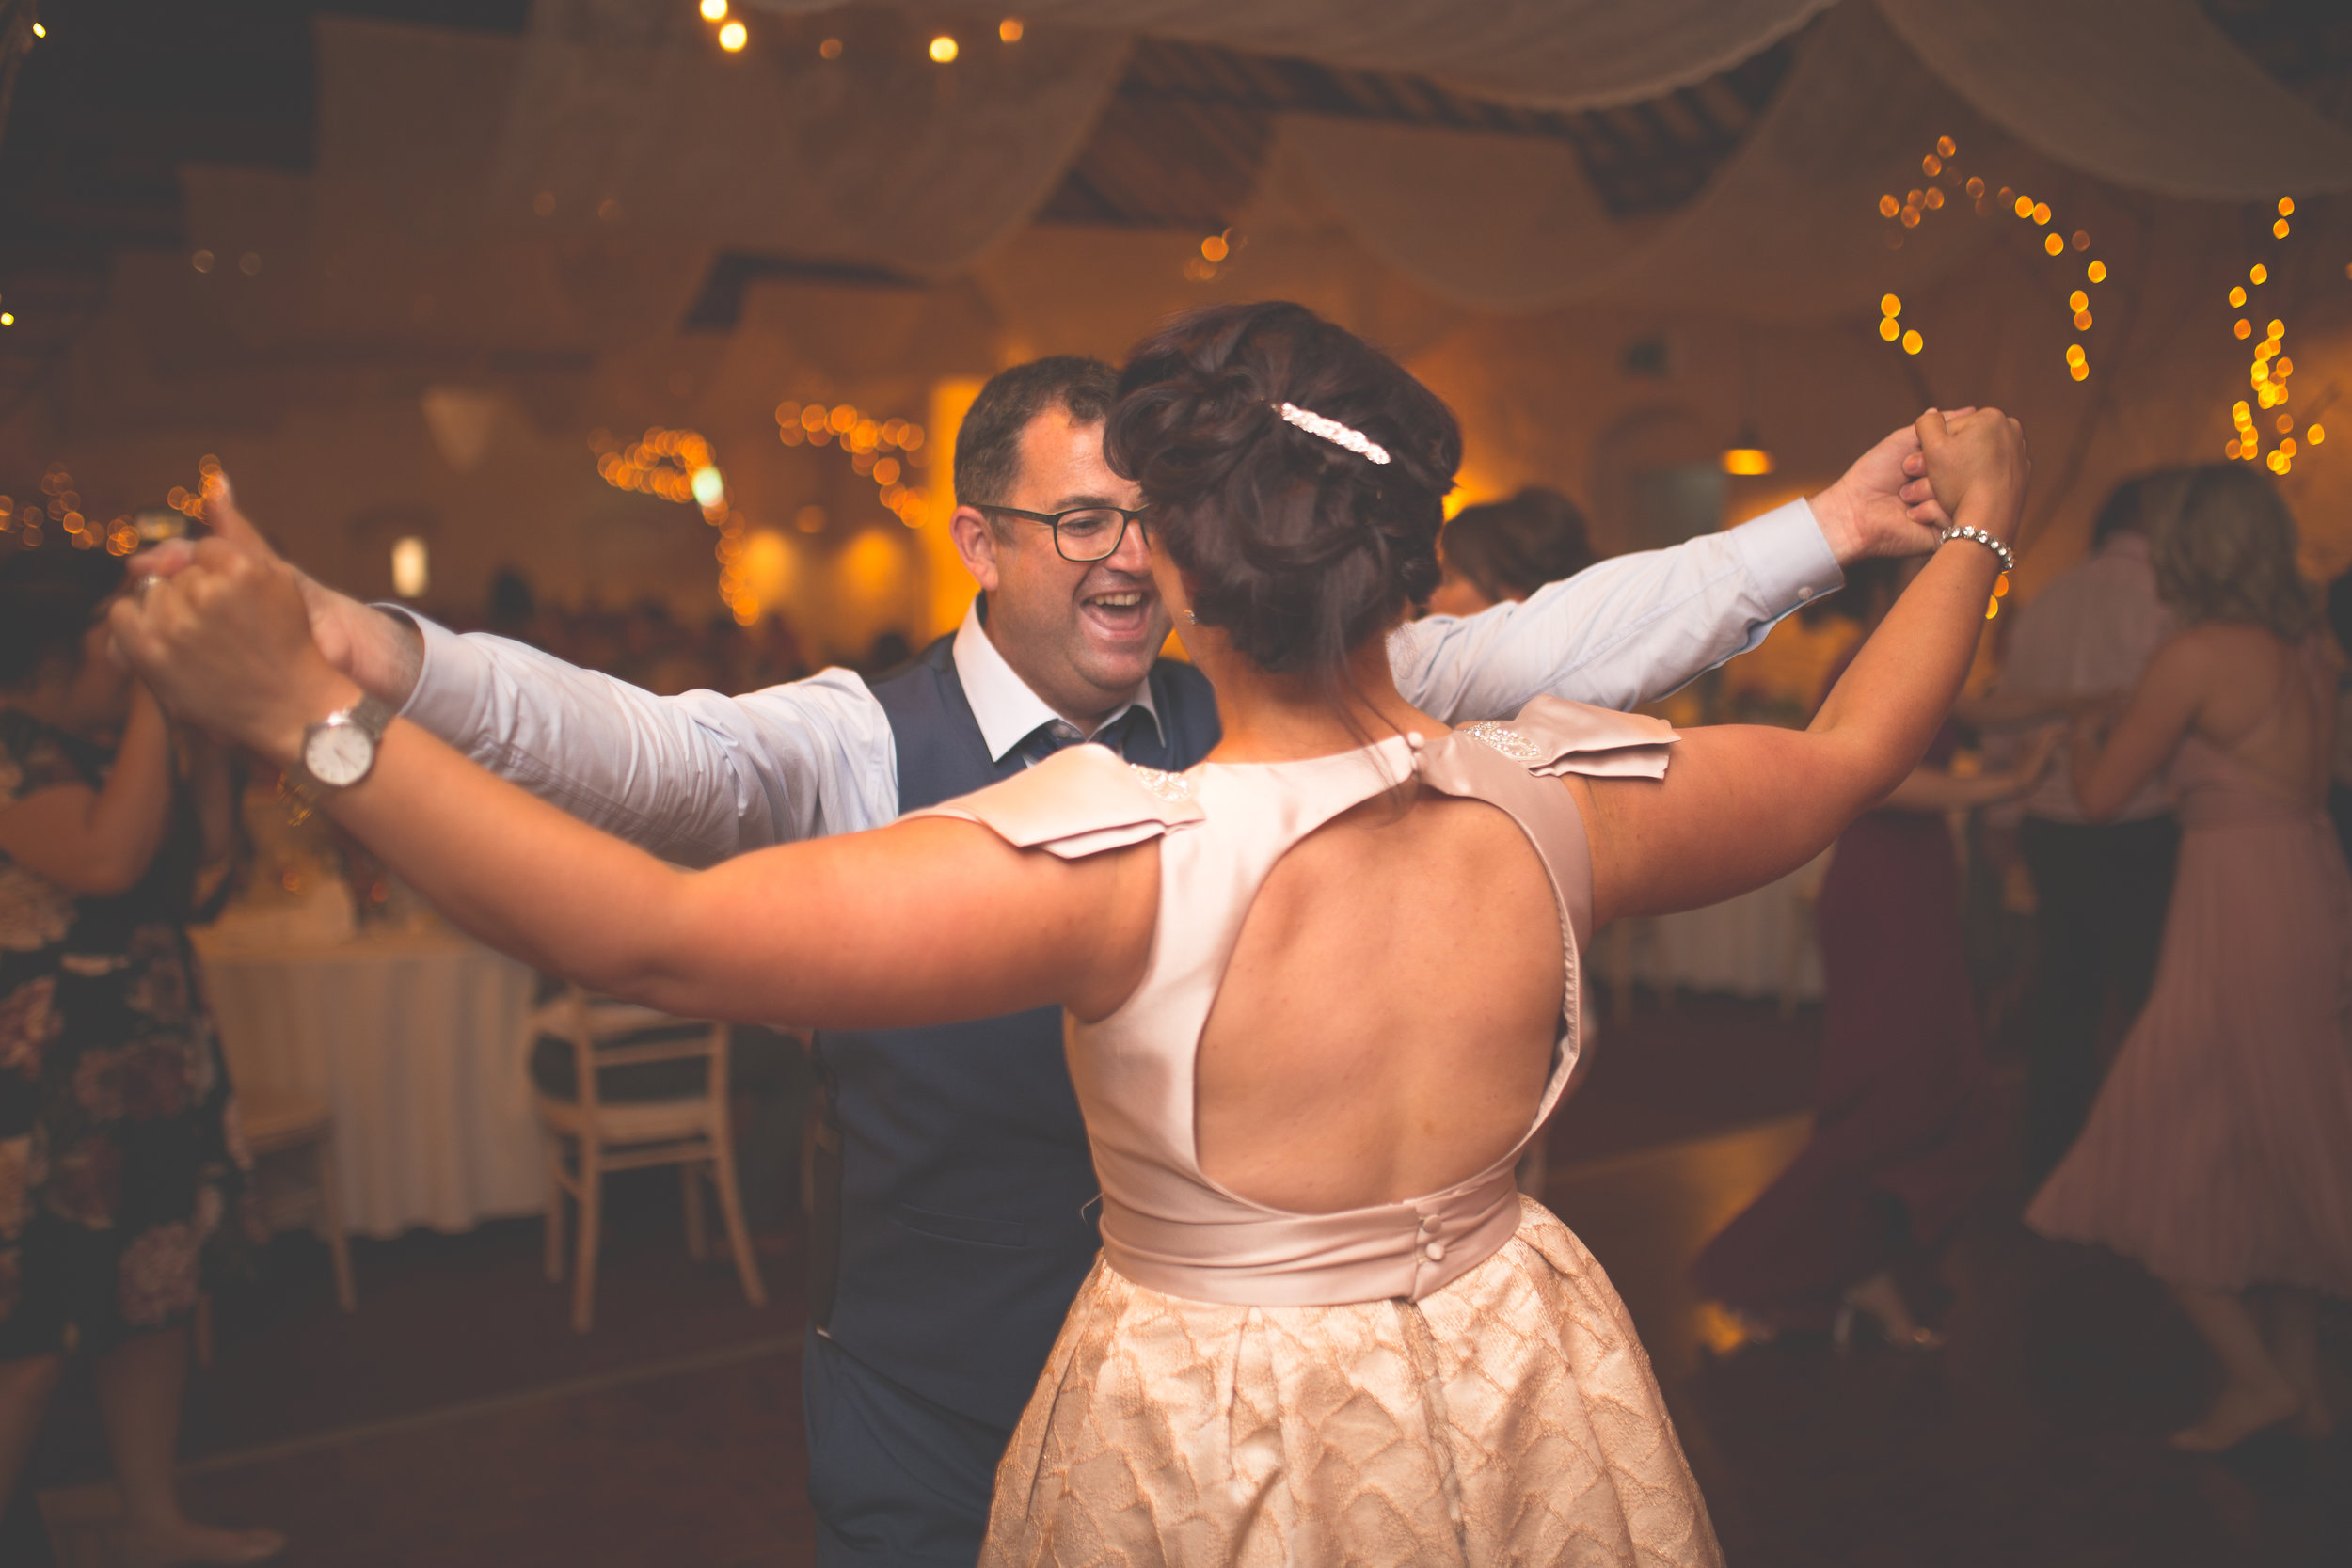 Brian McEwan Wedding Photography | Carol-Annee & Sean | The Dancing-92.jpg